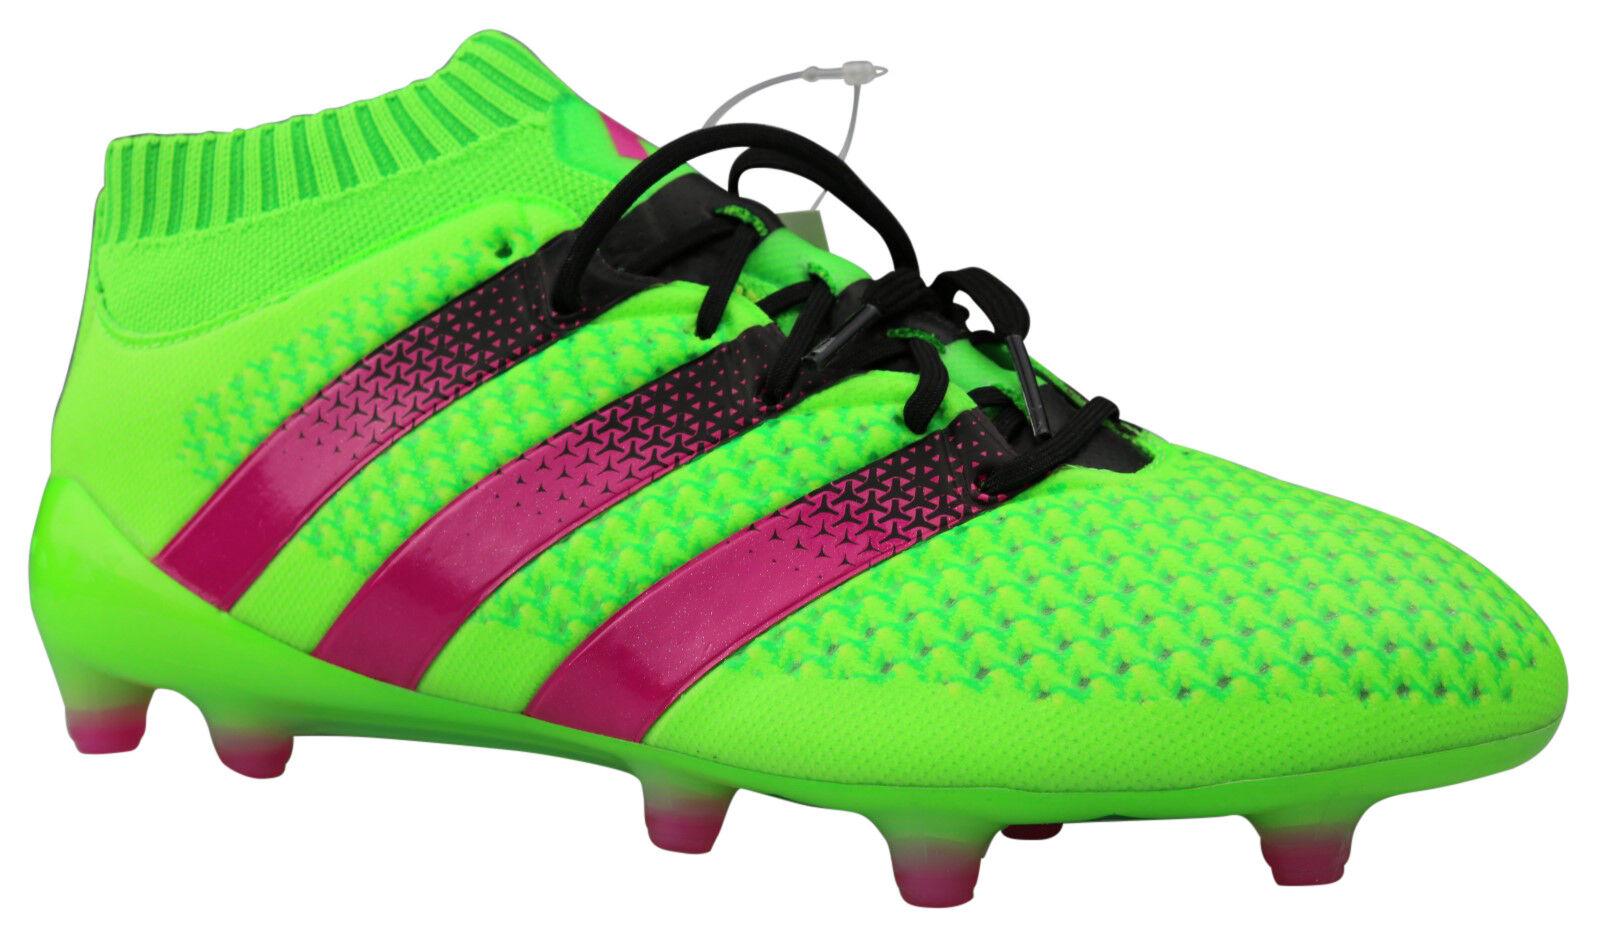 Mis. verde aq5151 camme calcio scarpe AG 16.1 ACE ADIDAS 39